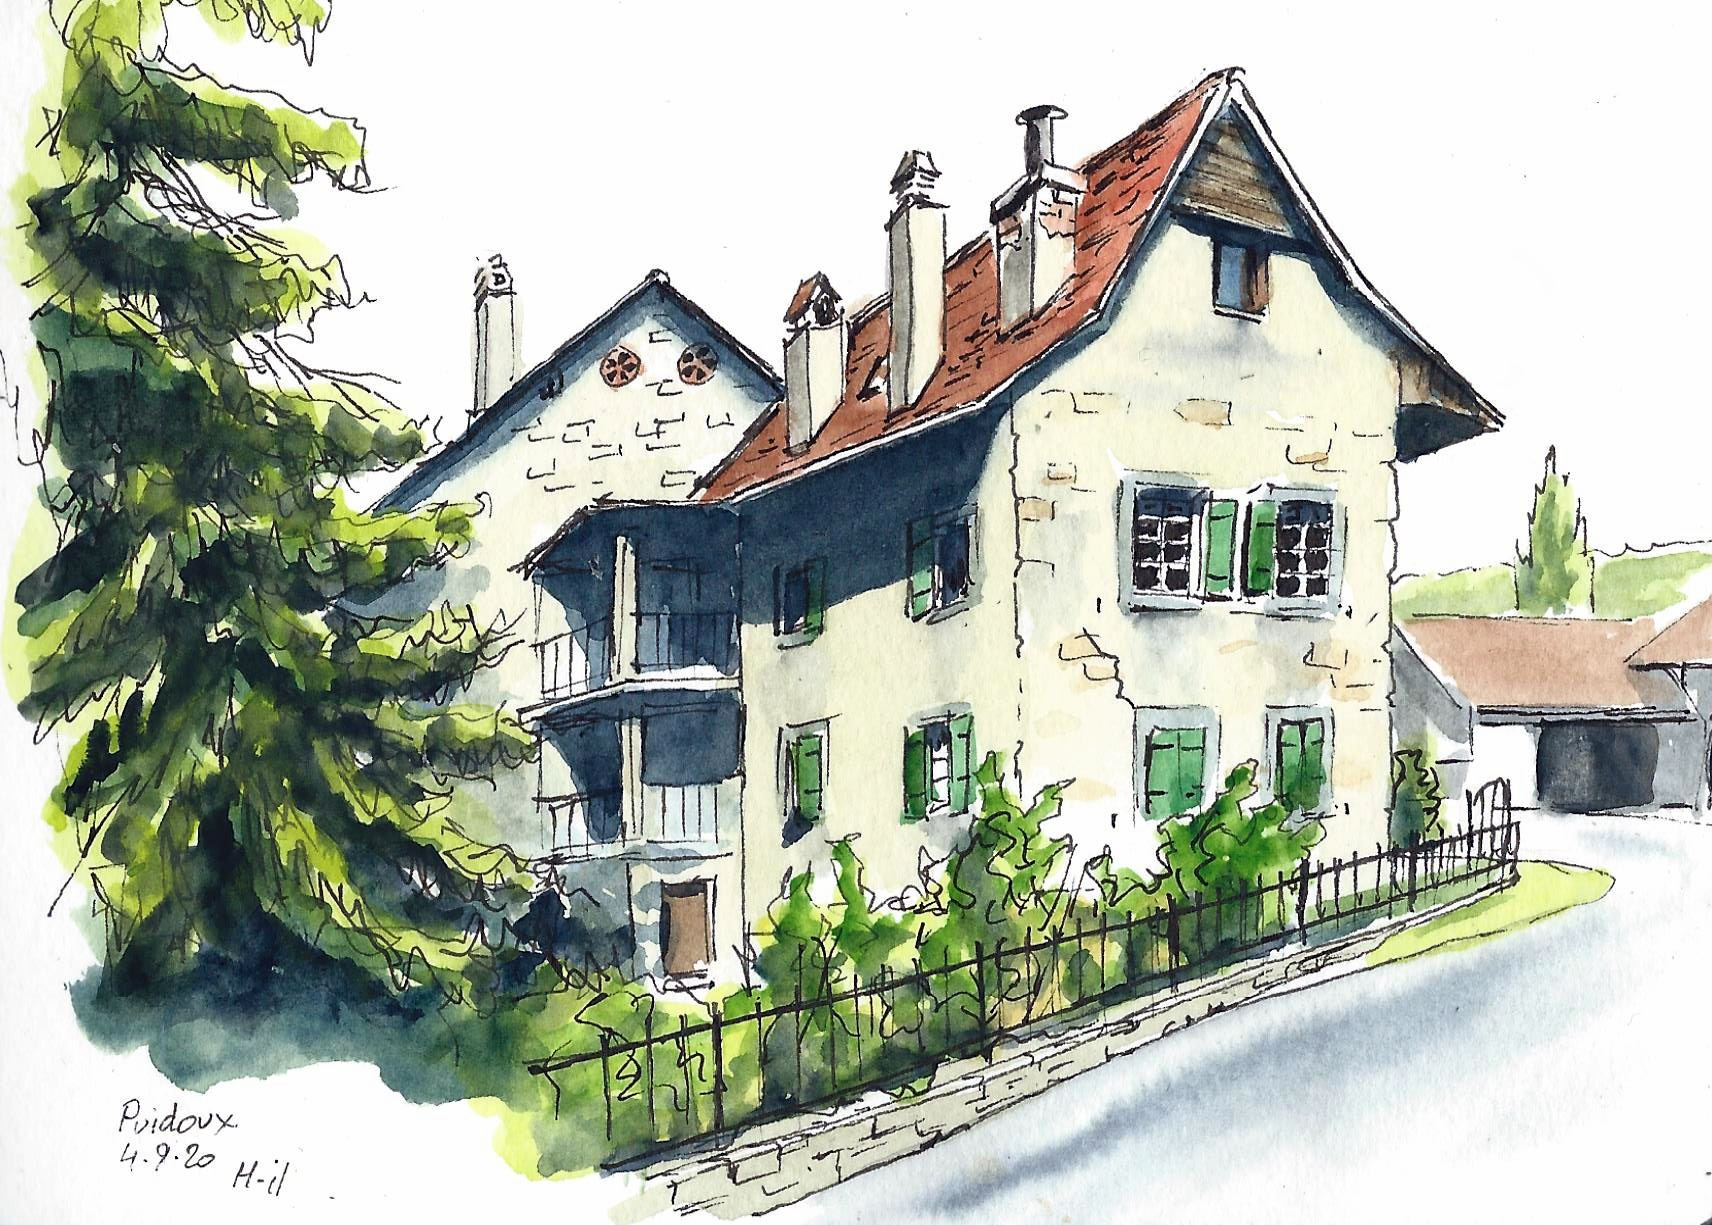 Maison Puidoux